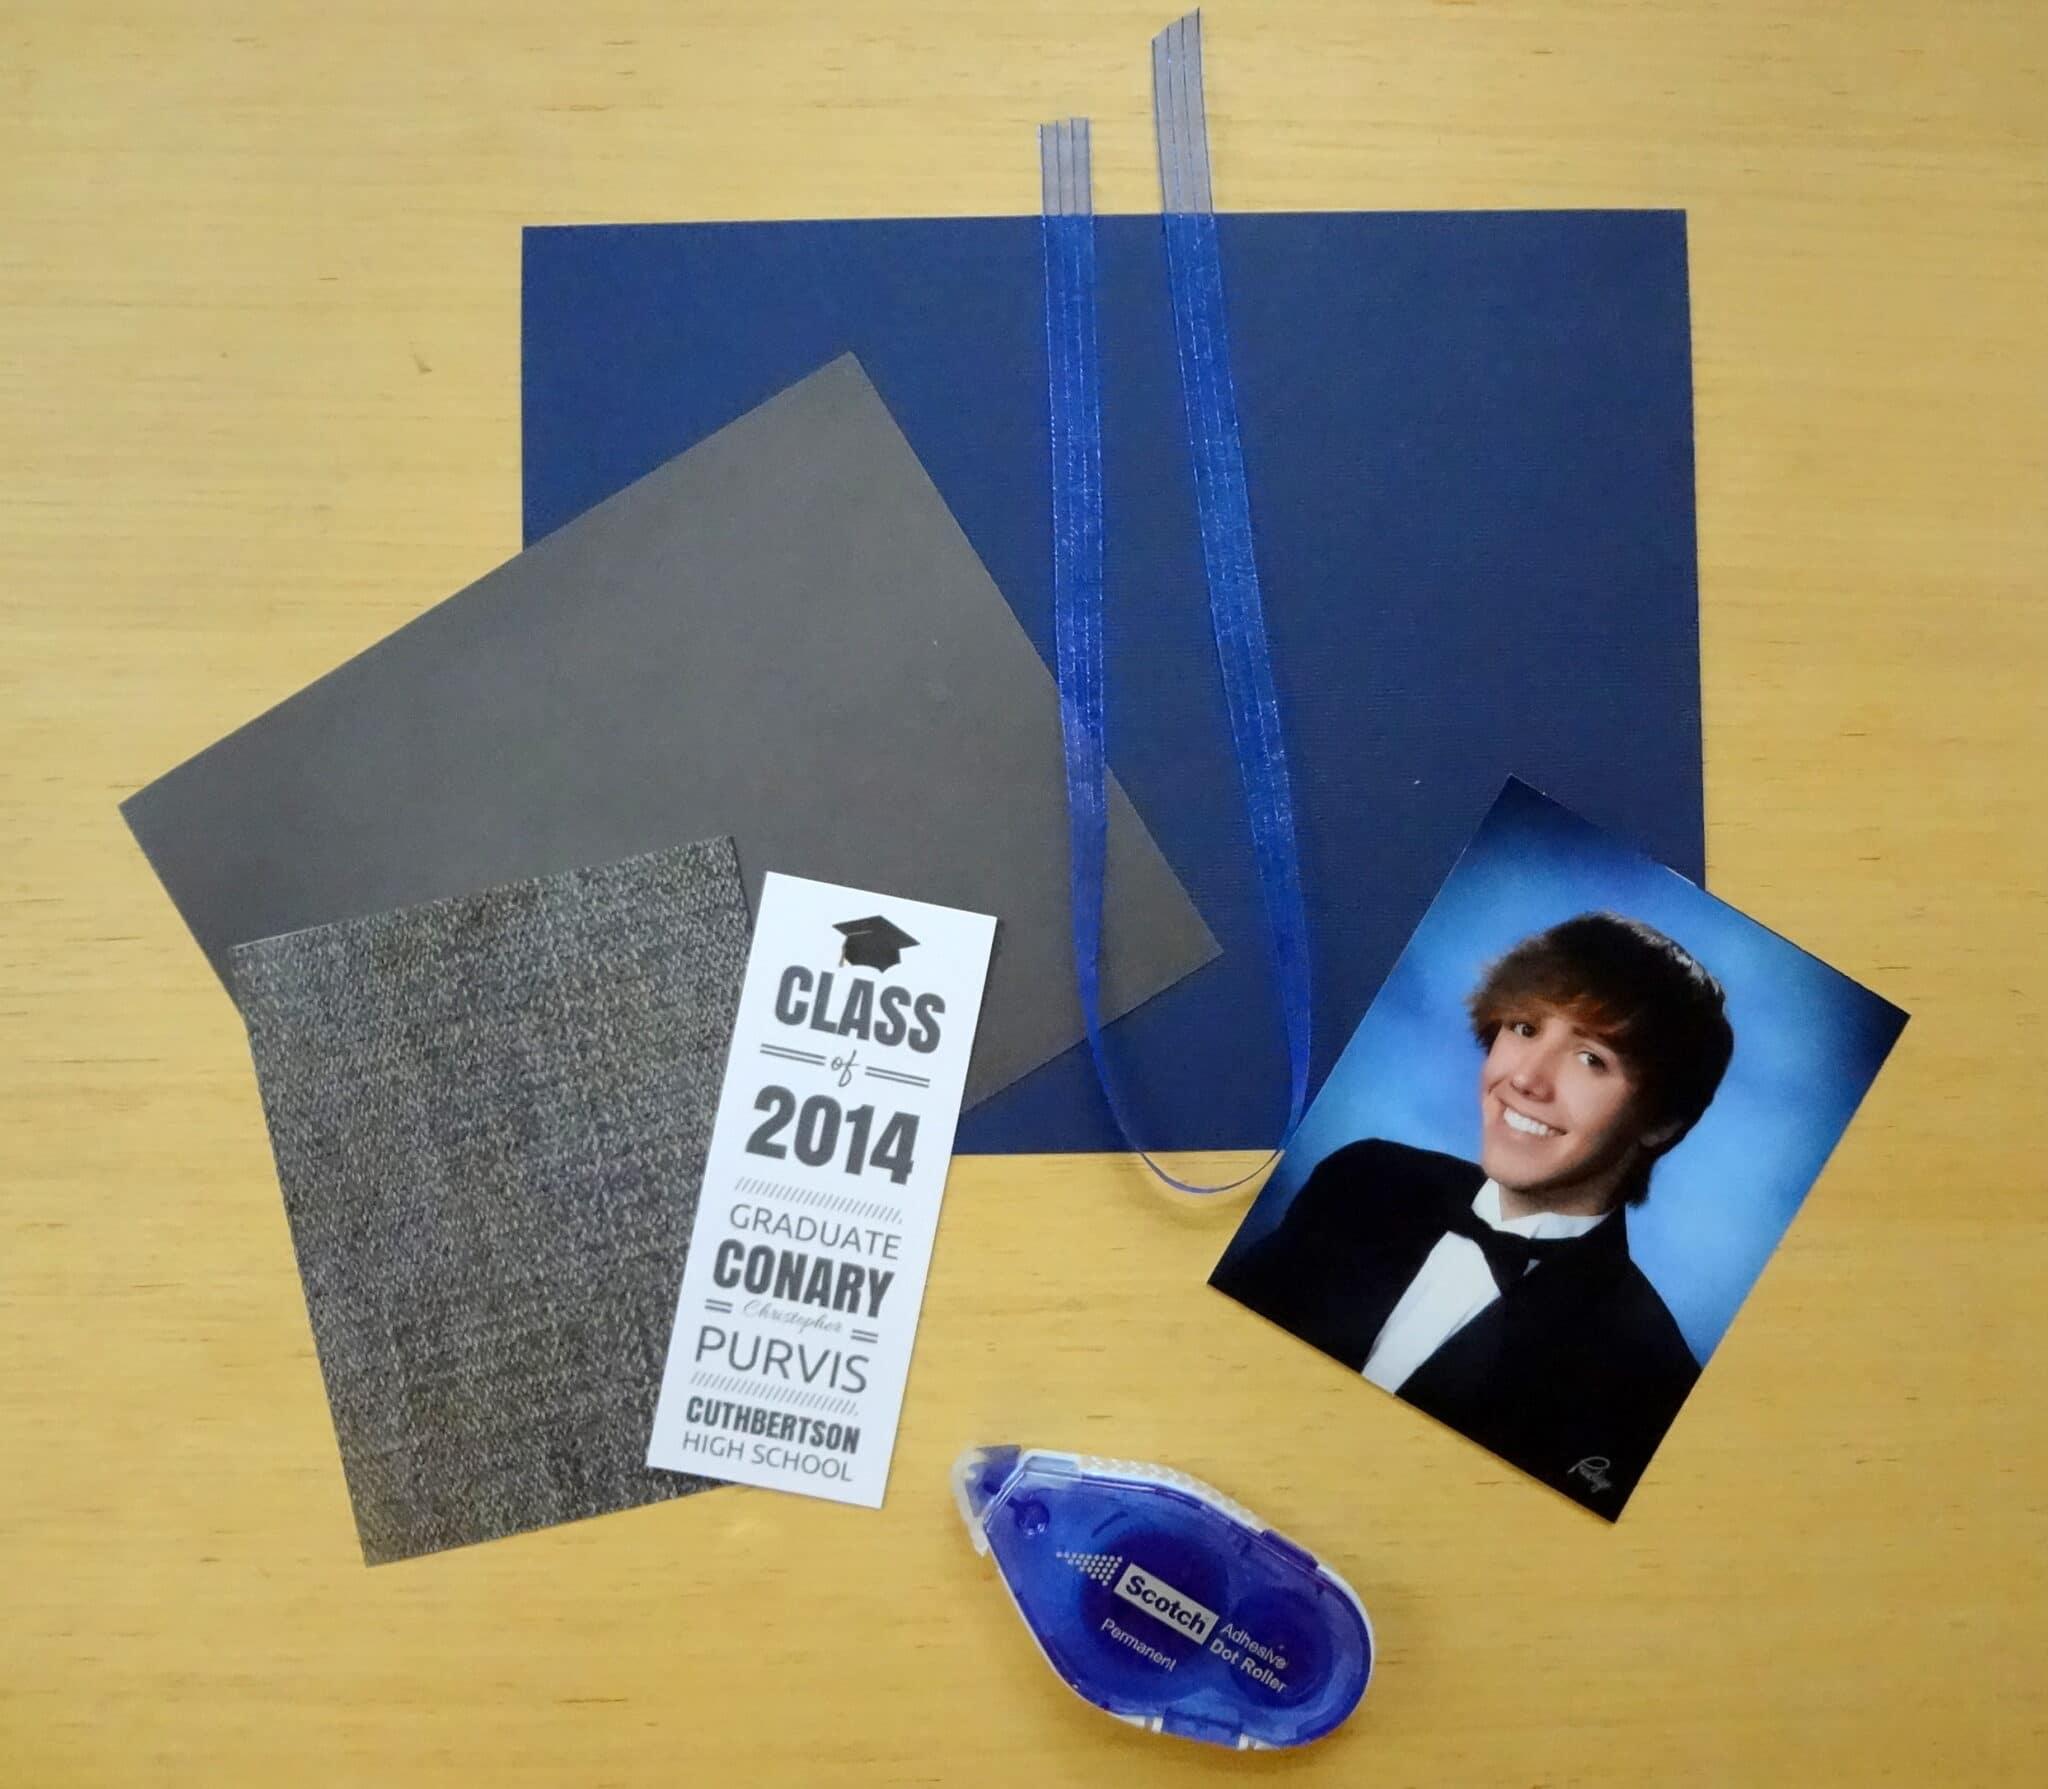 diy grad announcement - Homemade Graduation Invitations